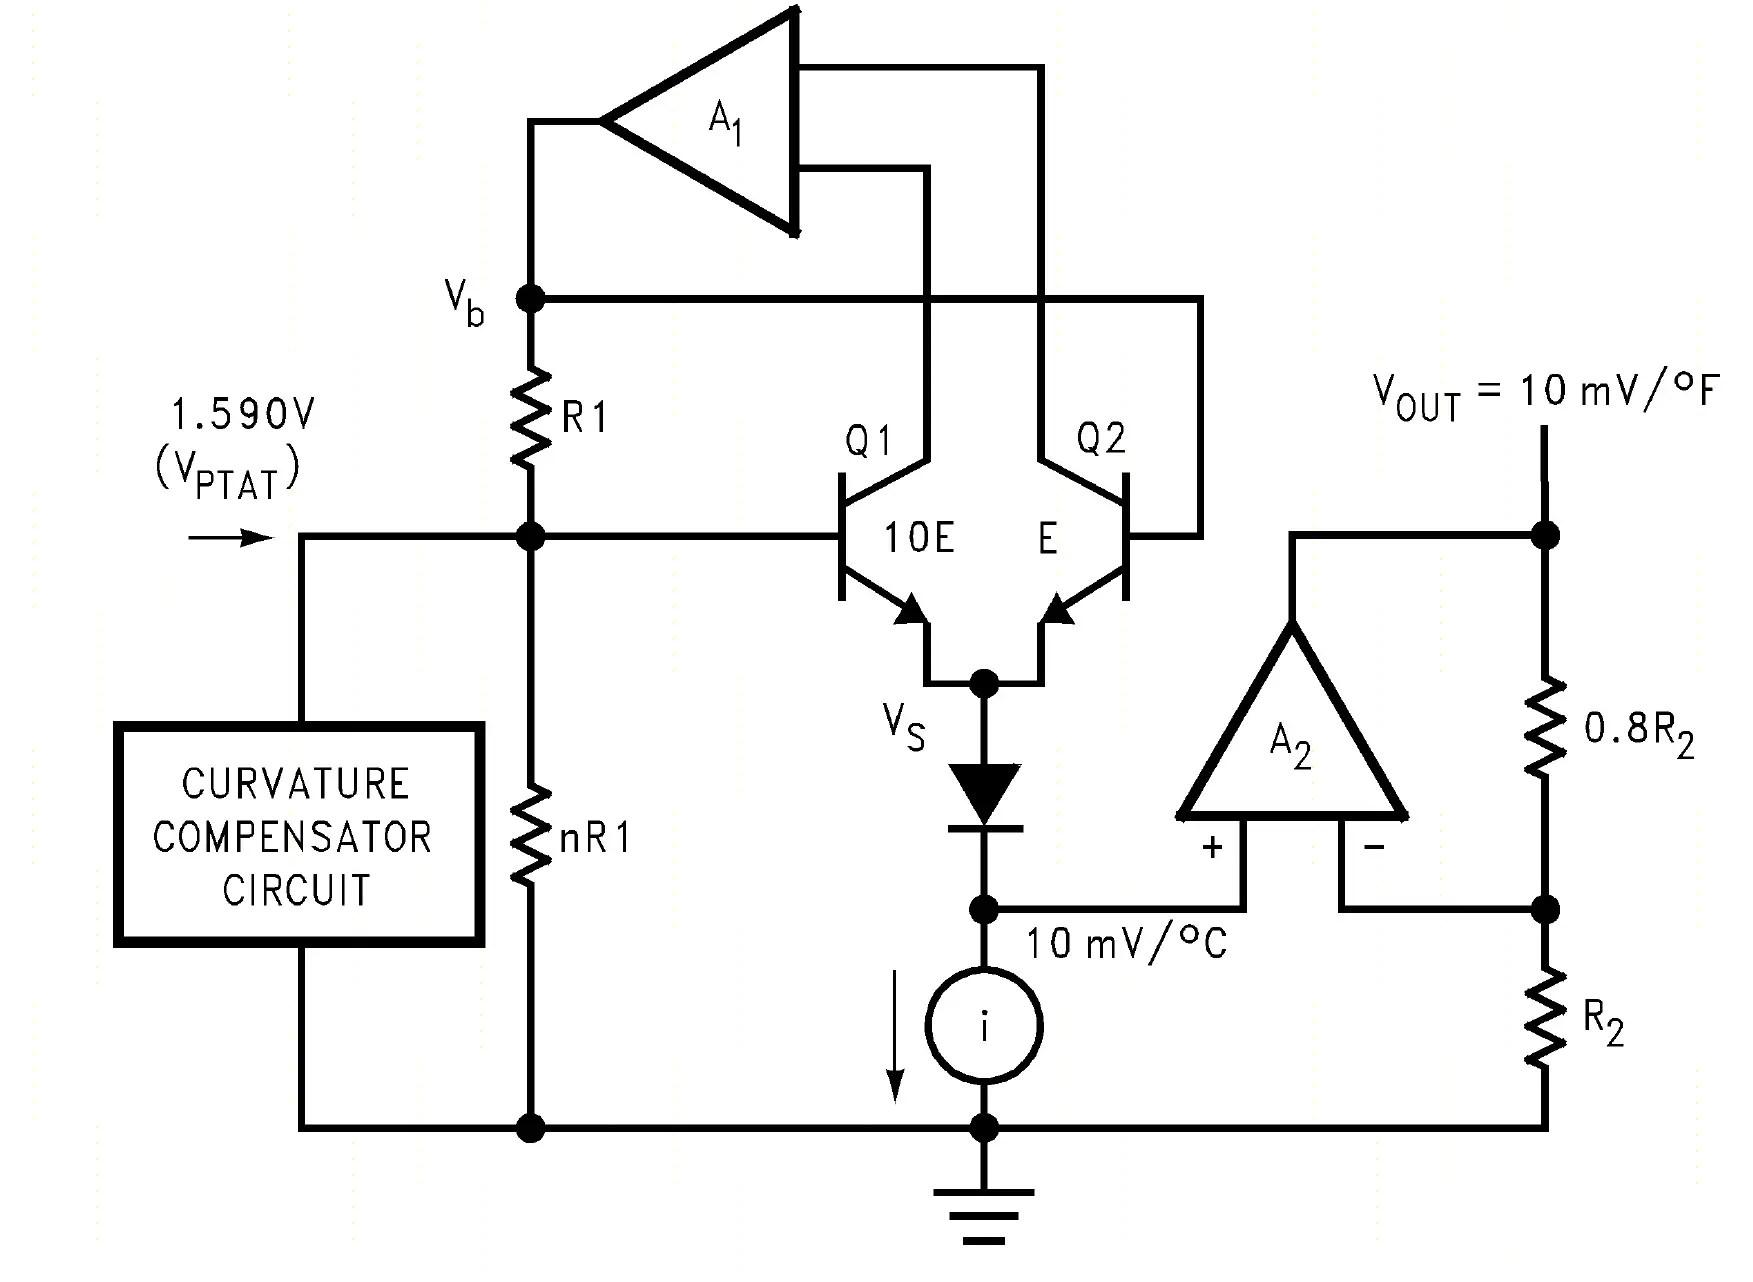 hight resolution of mv wiring diagram wiring diagram centre sp20 mv wiring diagram electric thermometer wiring wiring diagram detailsmv